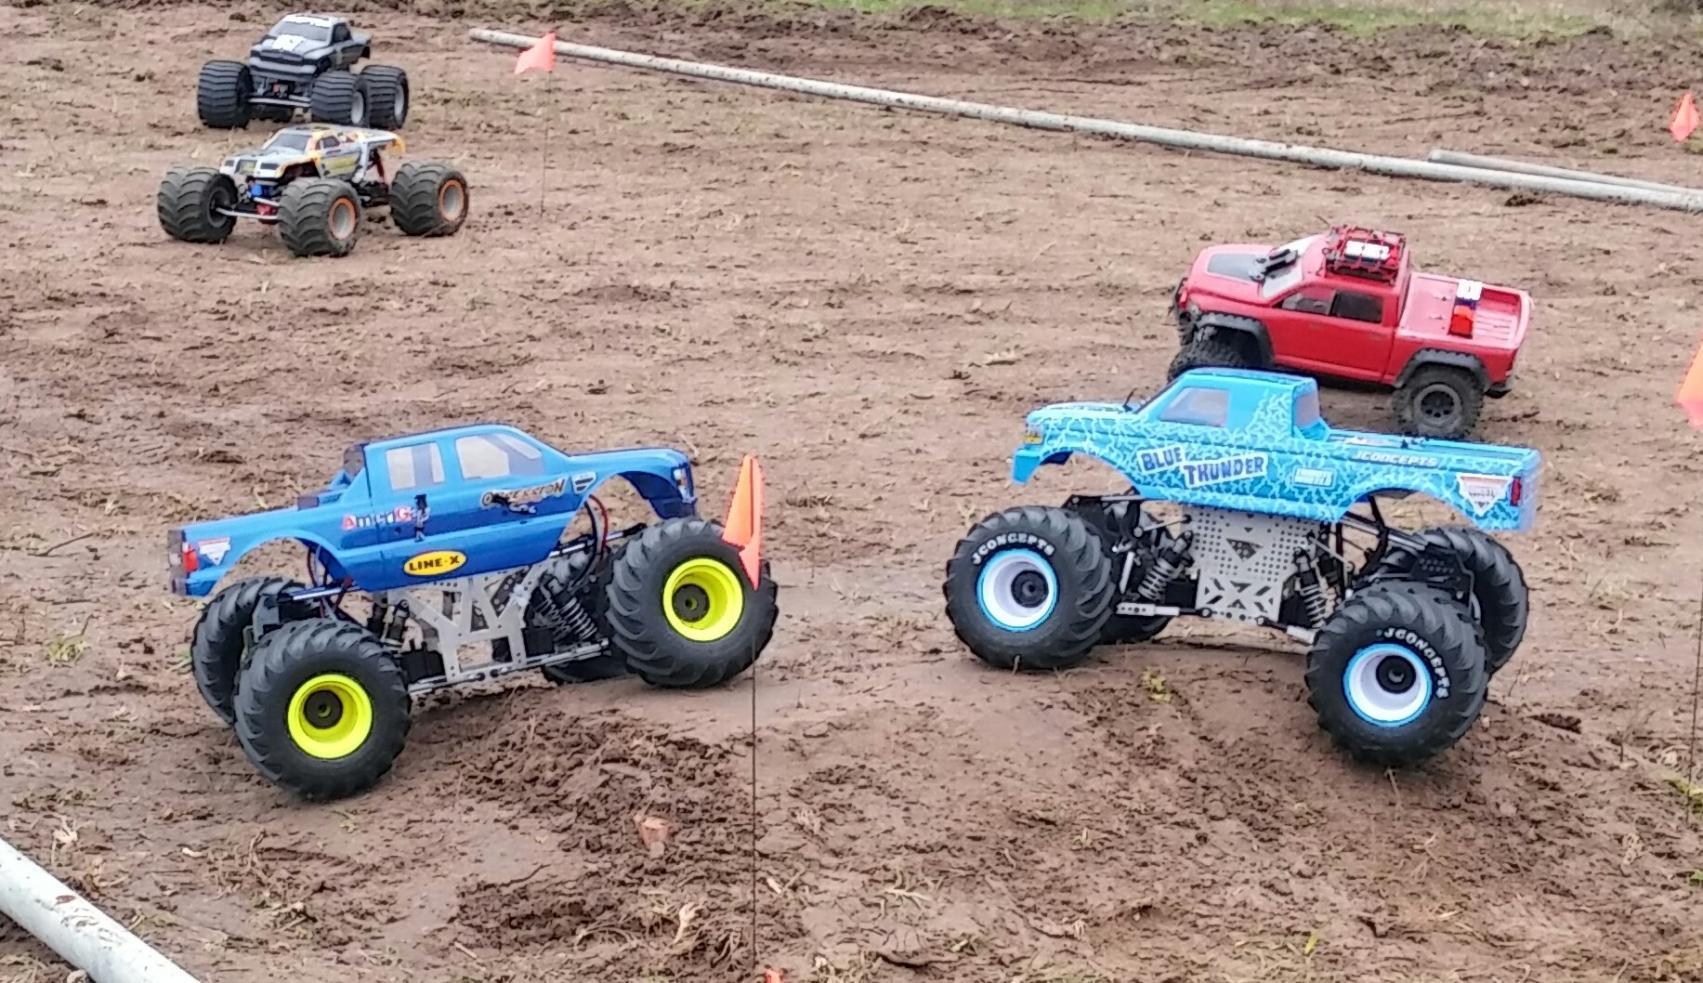 Rc Solid Axle Monster Truck Racing In Terrel Texas R C Tech Forums